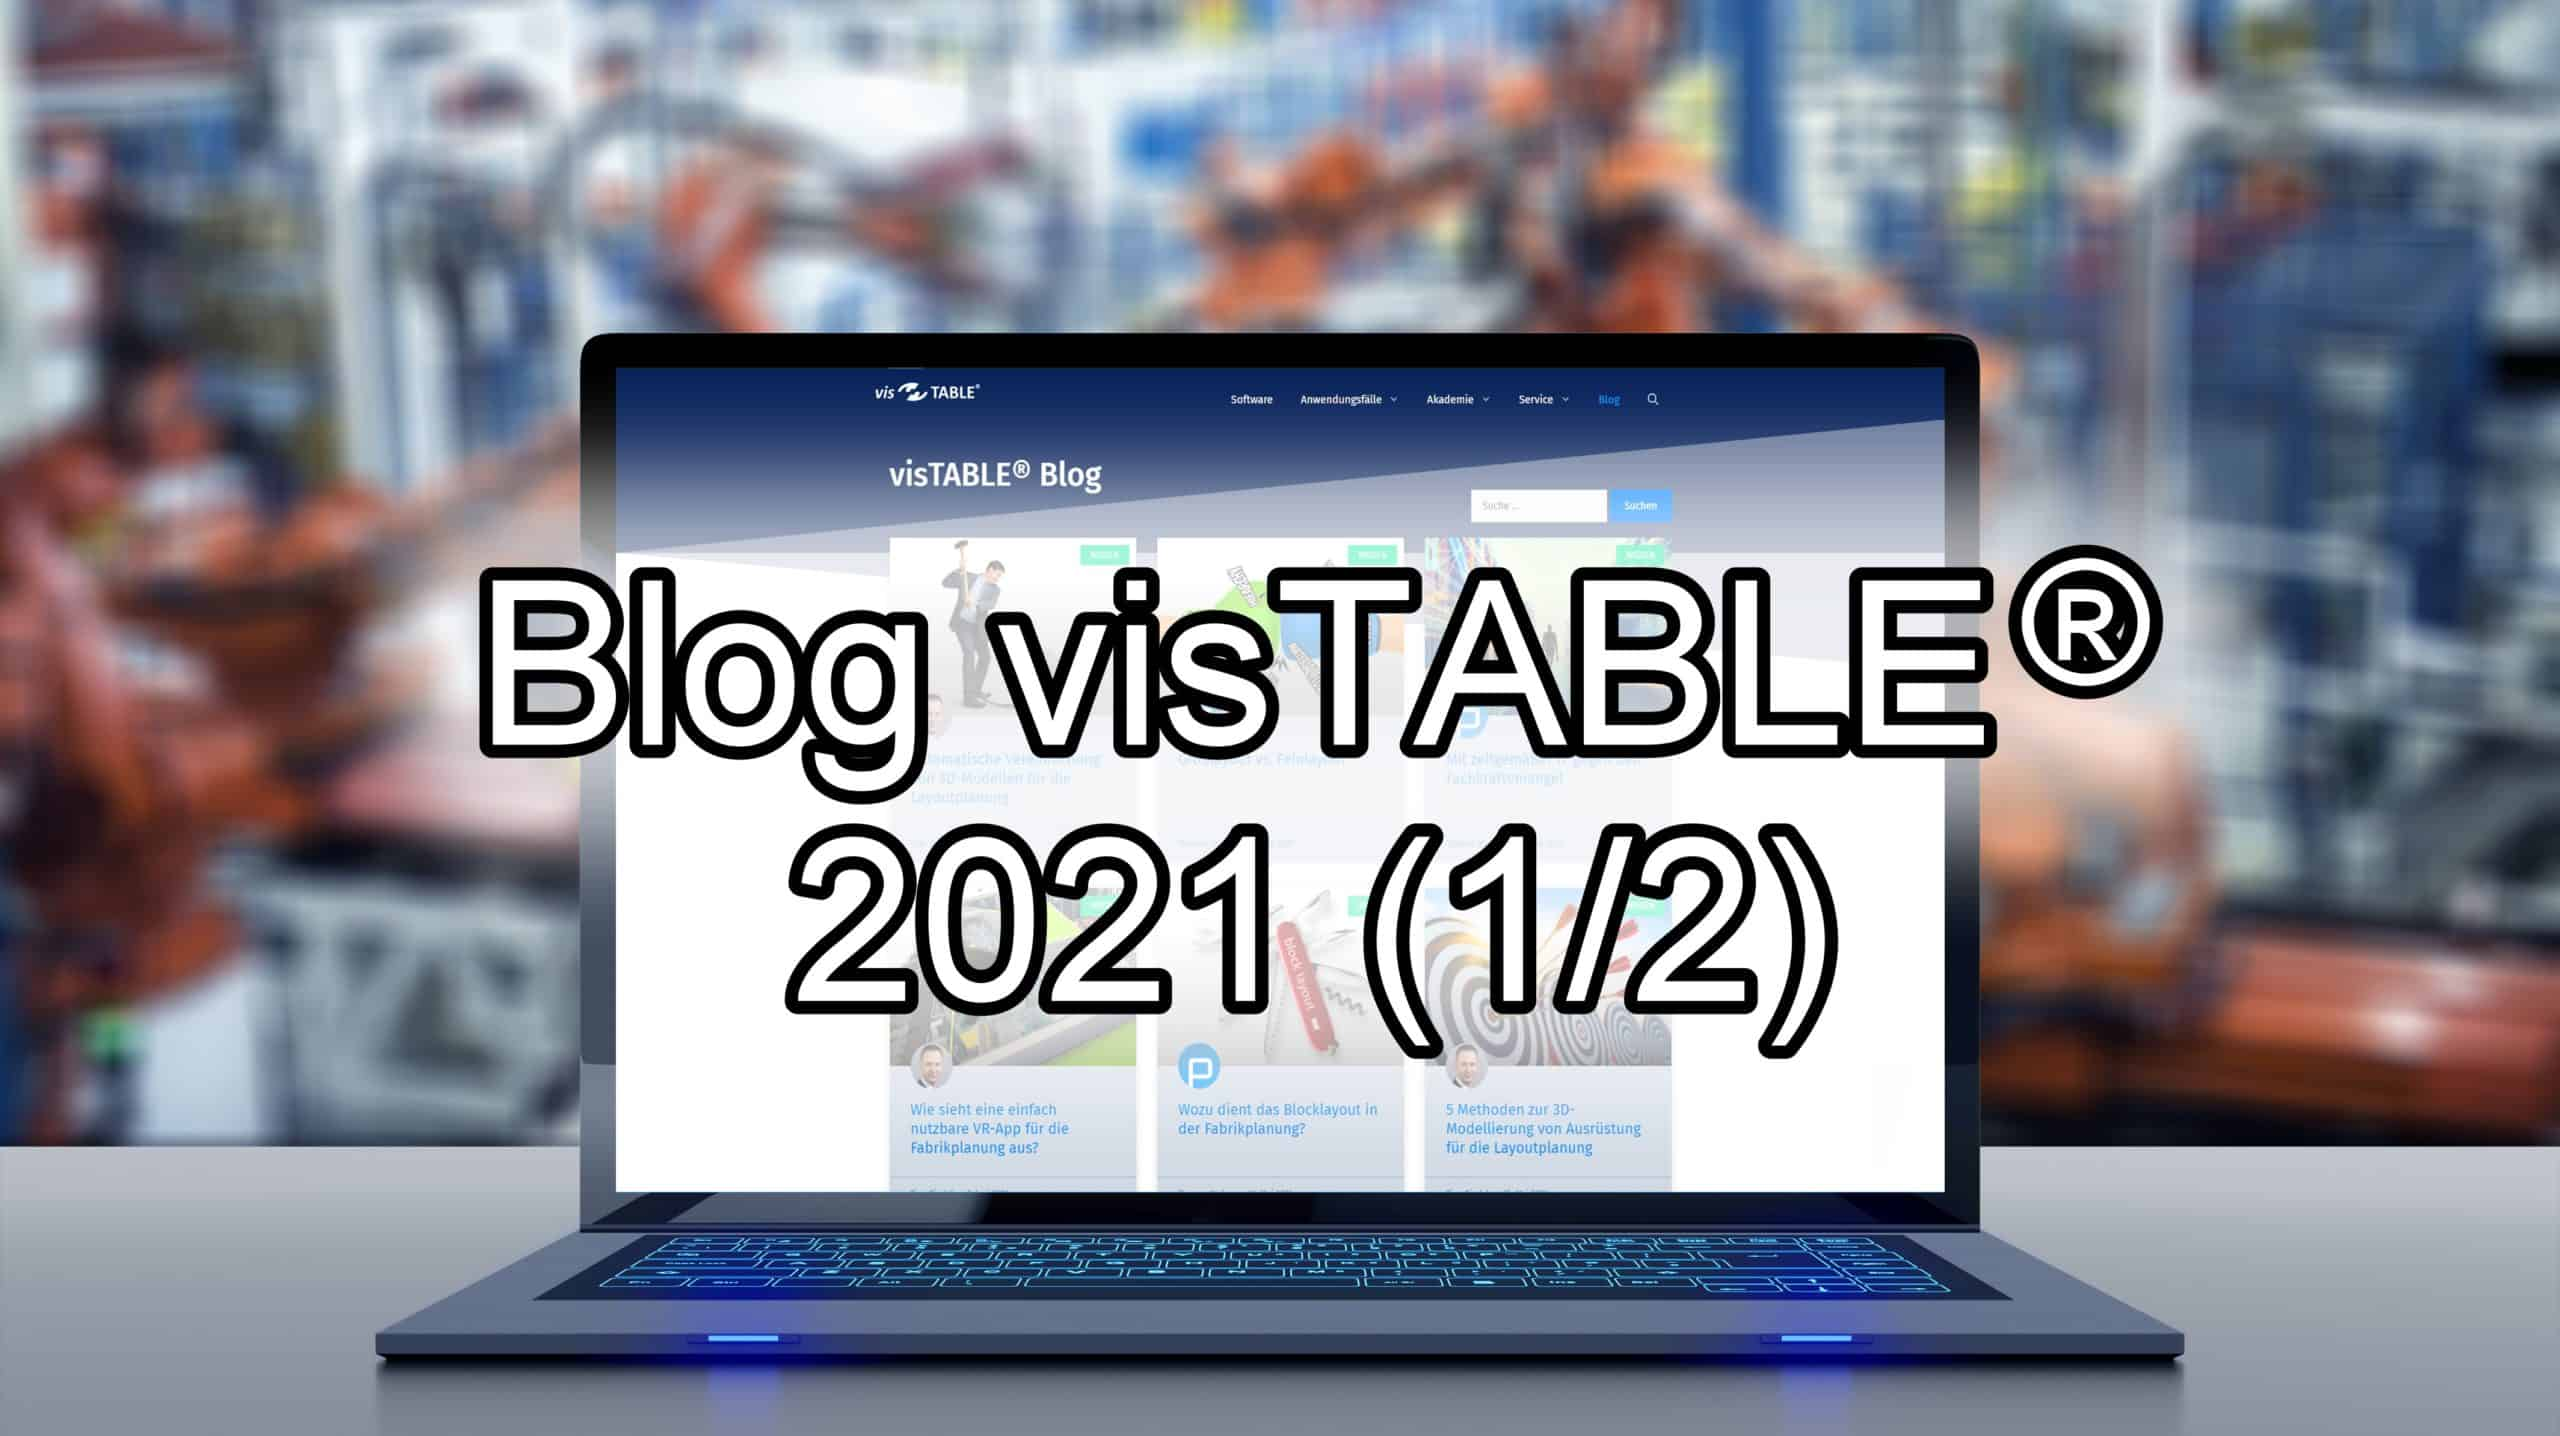 Blog visTABLE Wissenswertes zur Fabrikplanung 2021 1-2